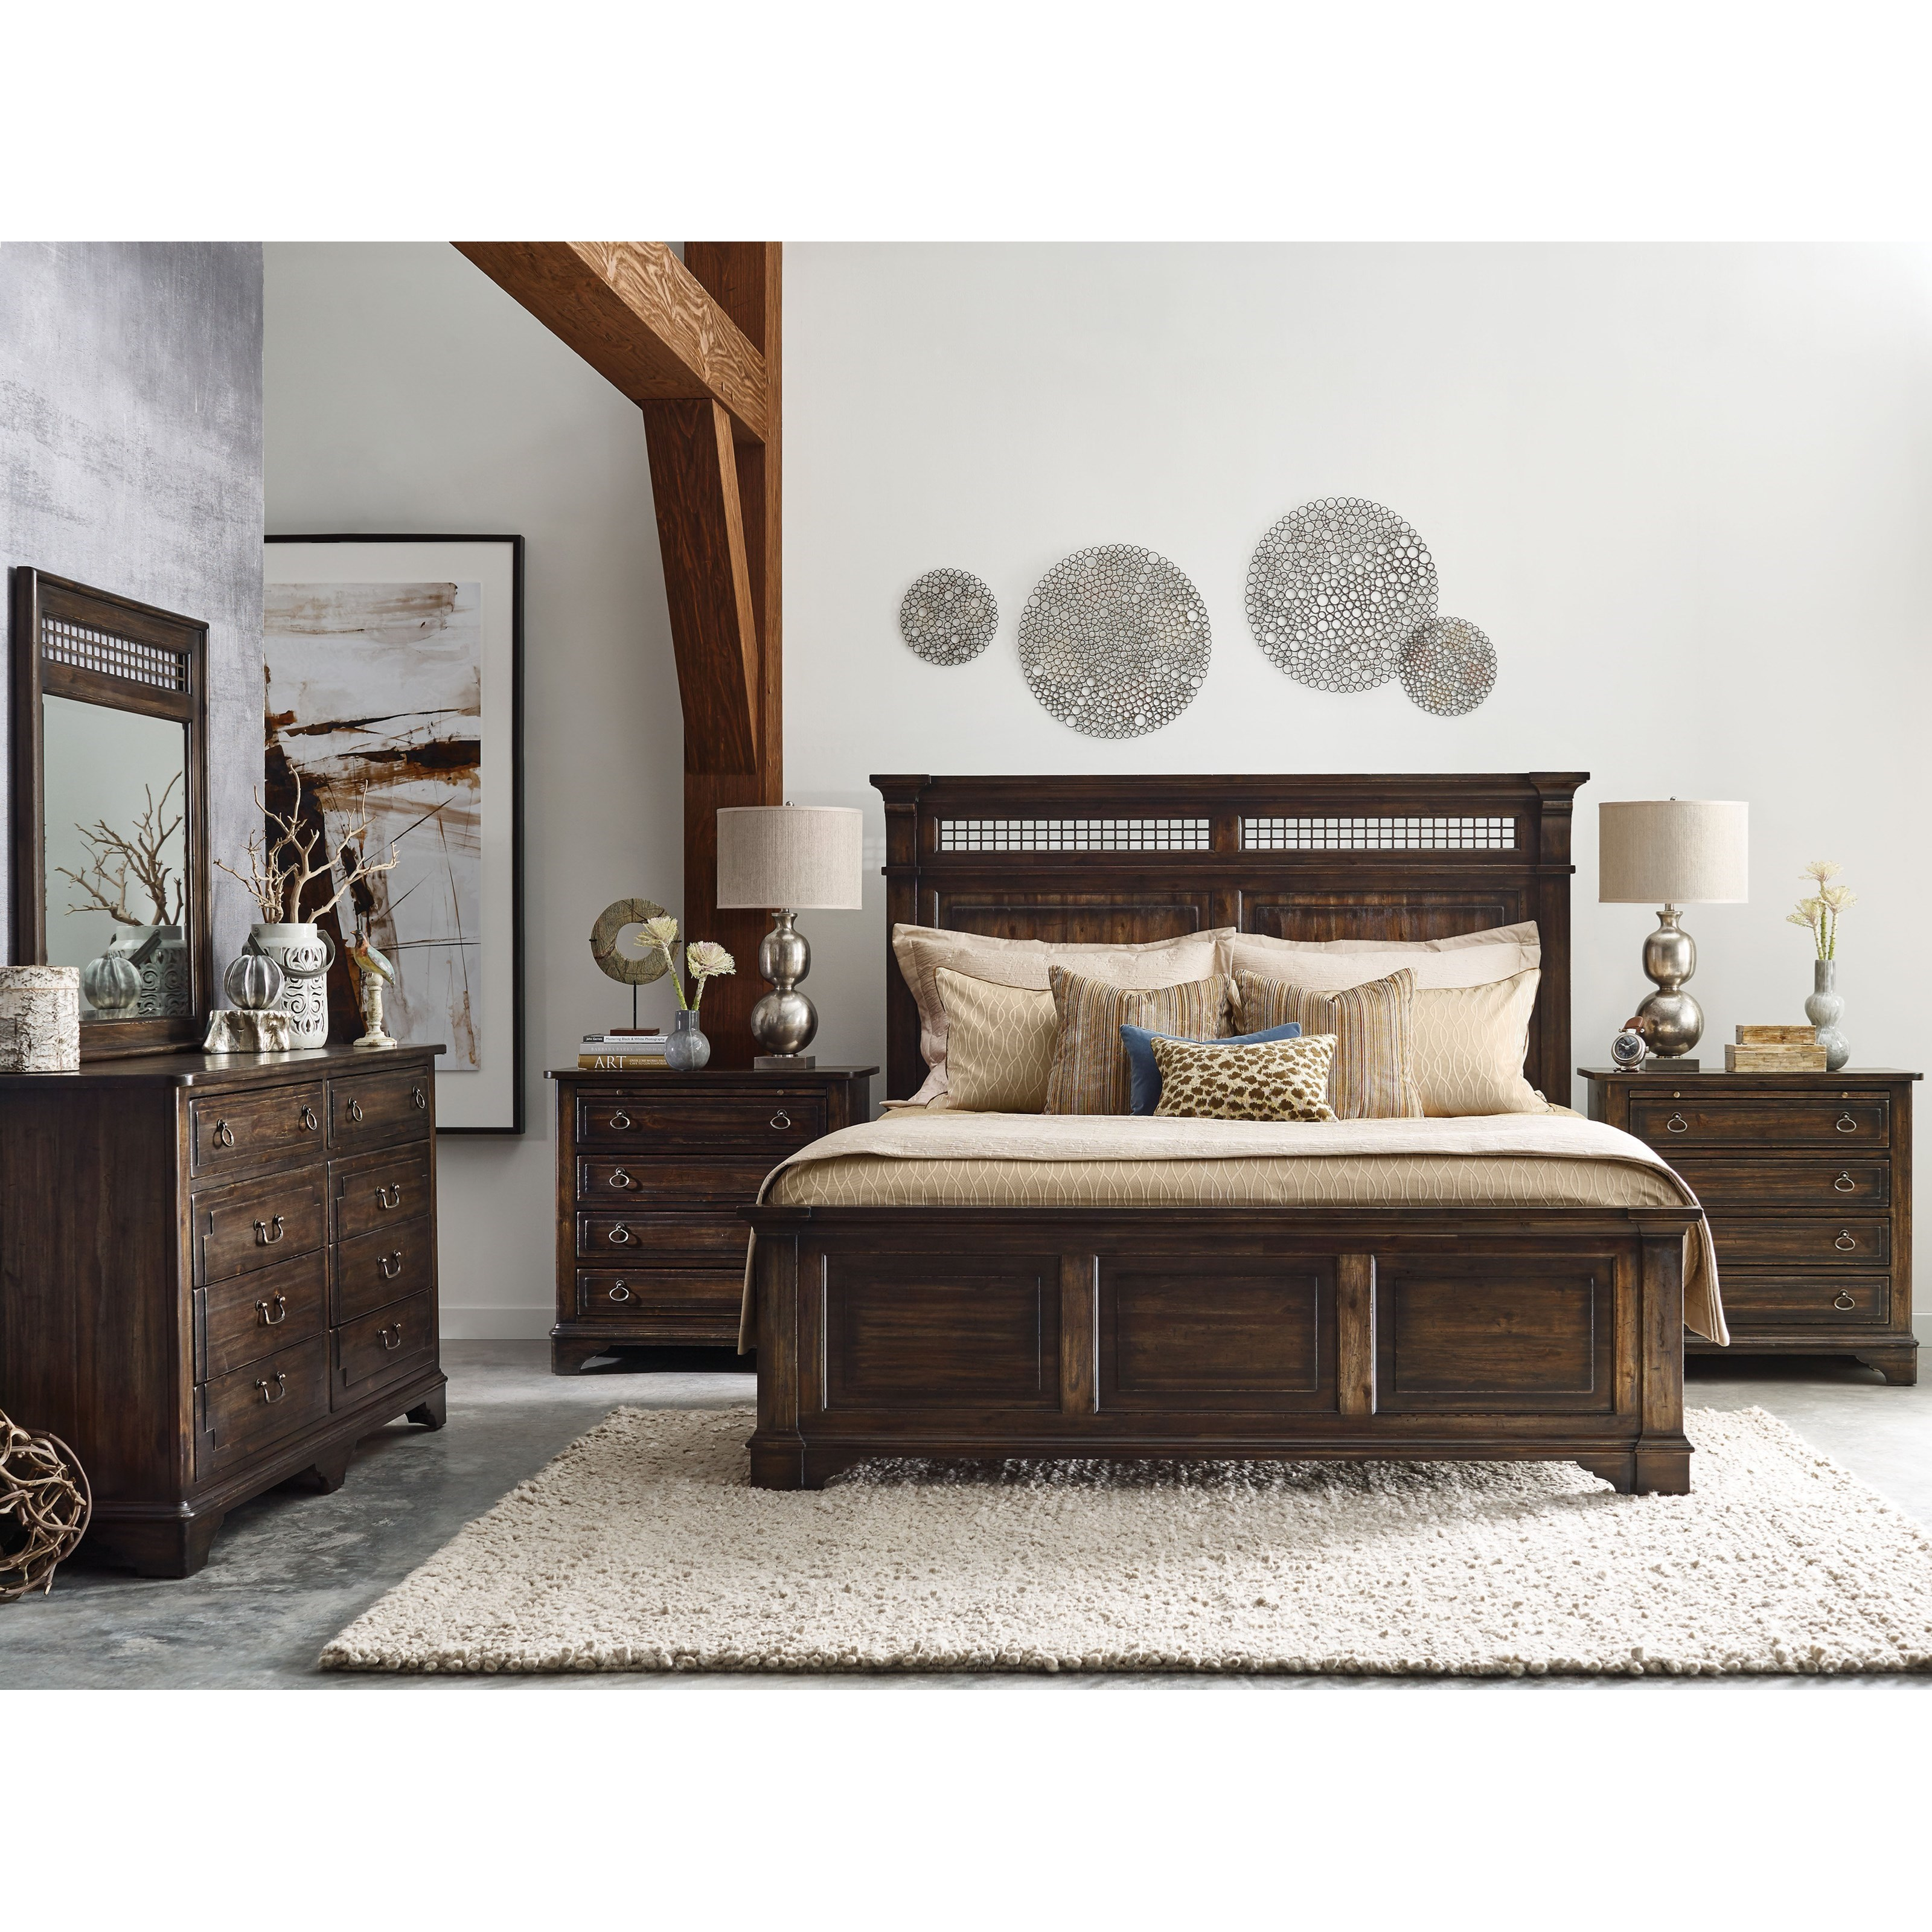 Kincaid Furniture Wildfire Queen Bedroom Group Becker